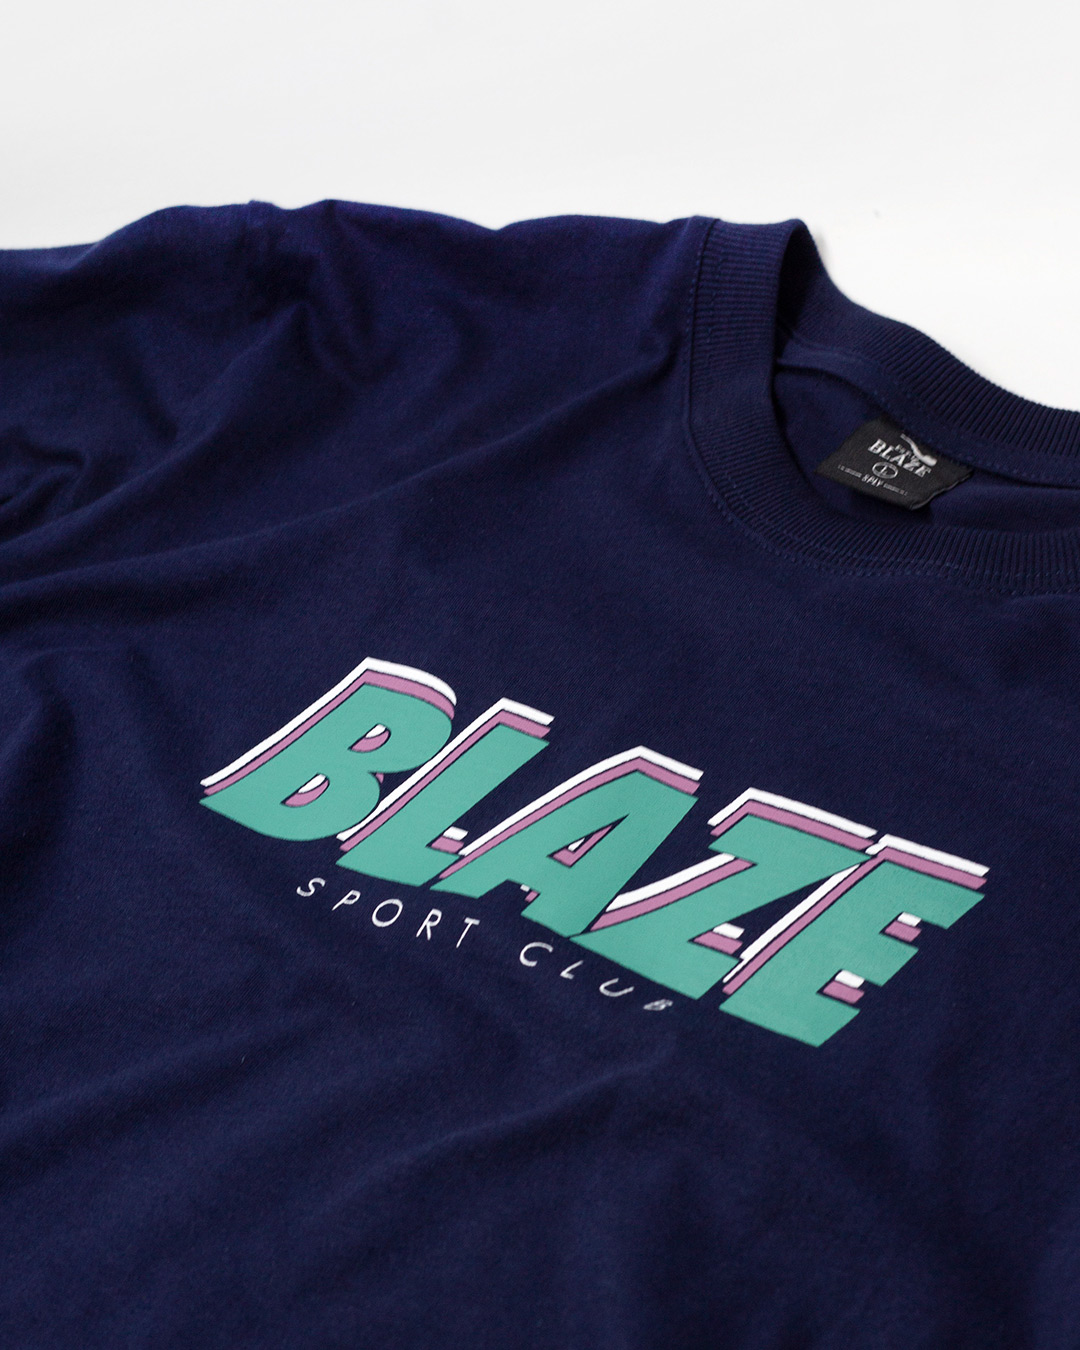 Camiseta Sport Club Marine Blaze Supply